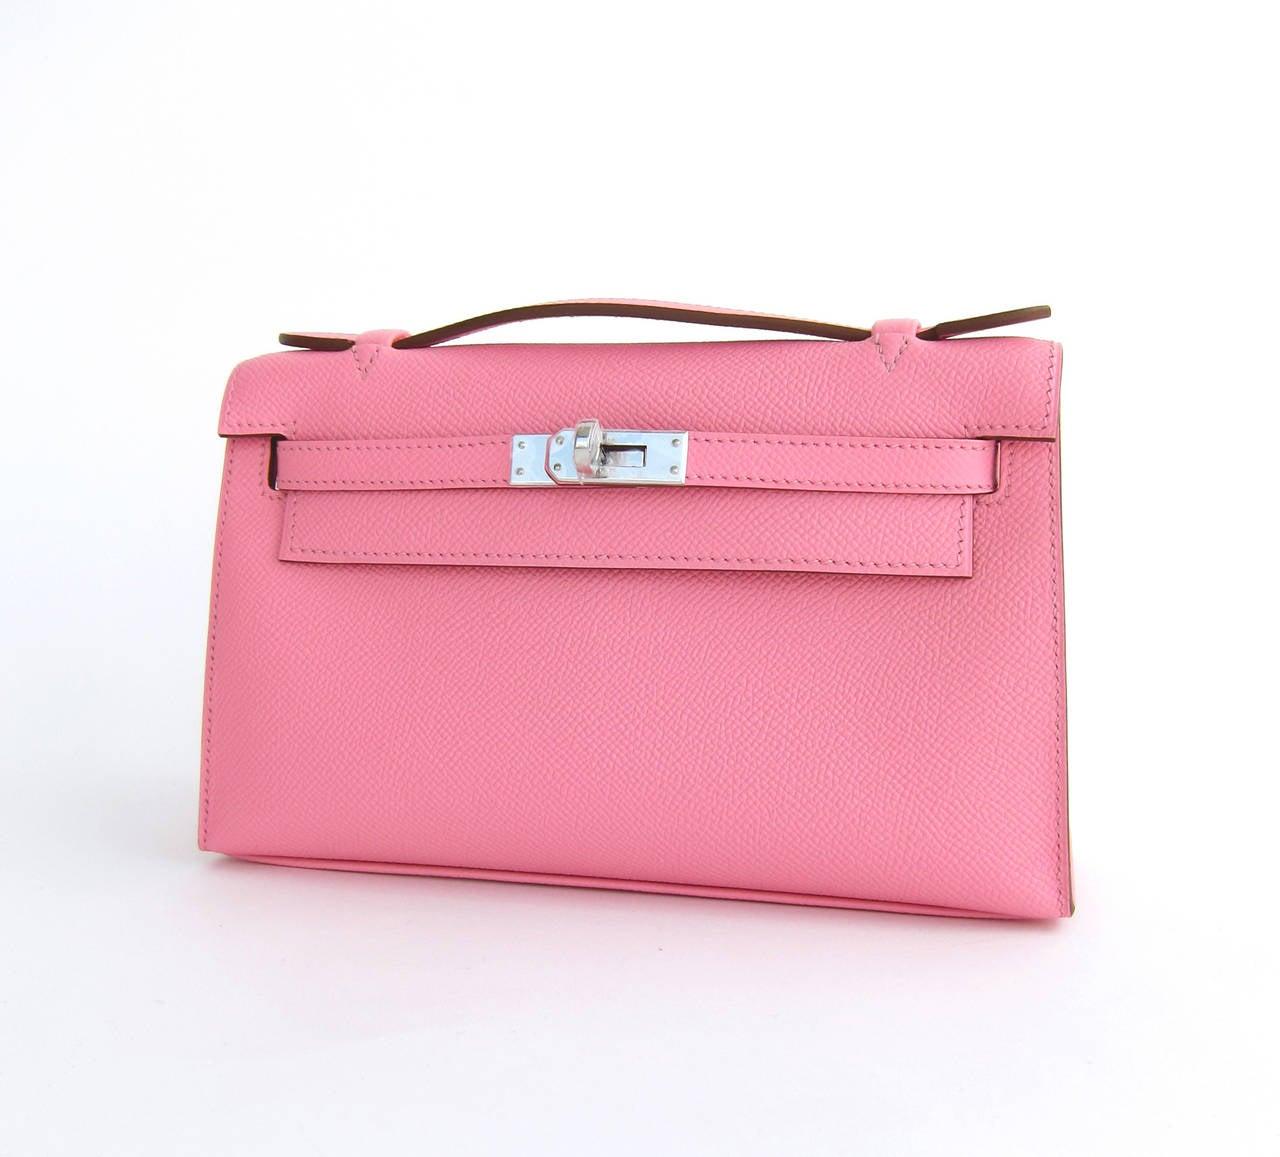 Hermes Rose Confetti Epsom Kelly Pochette Pink Clutch Bag Love 4